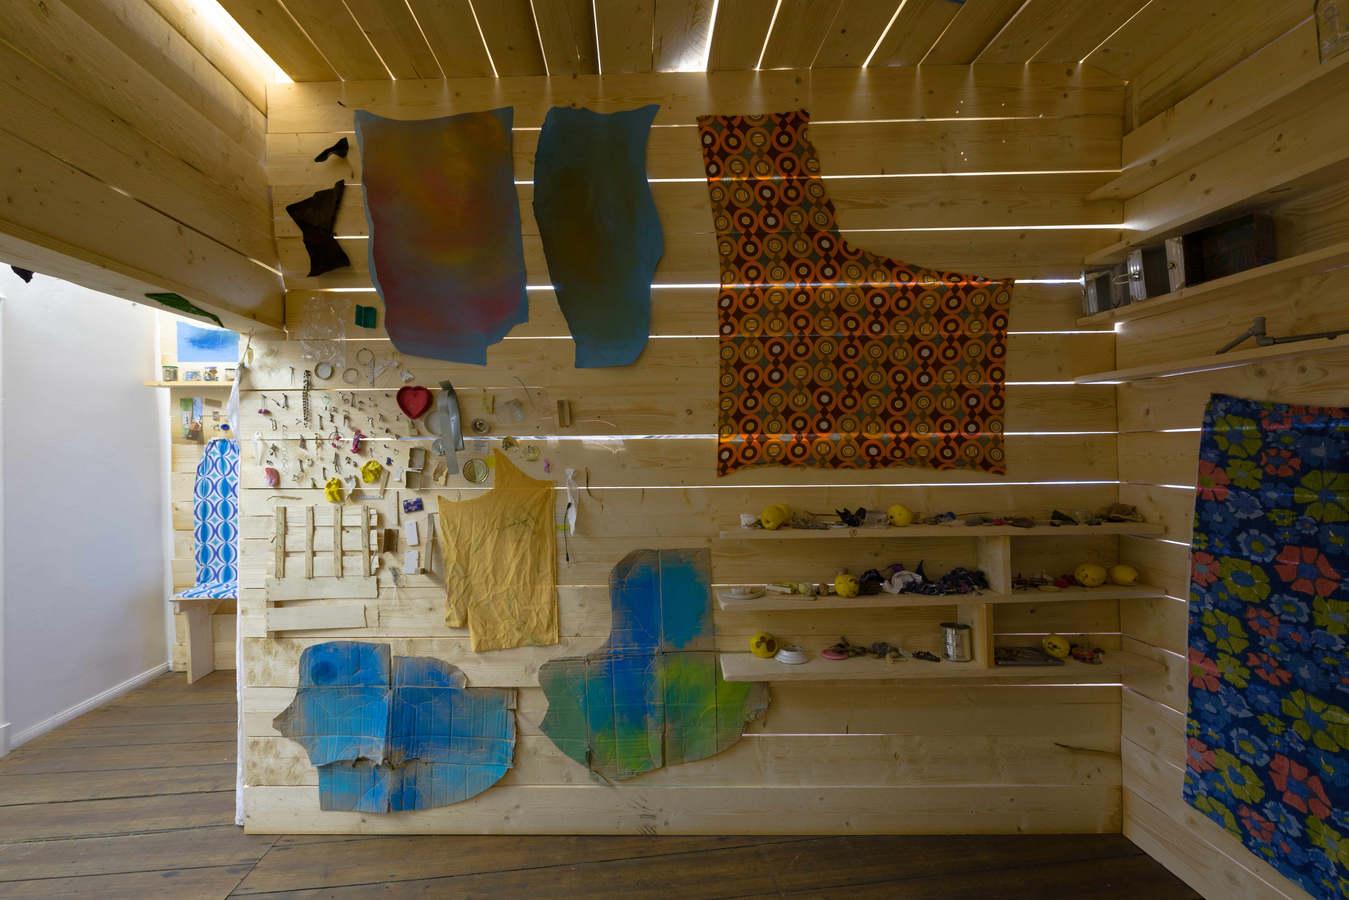 TGood RETO PULFER artdoc Grimmuseum 05 12 2014 _0346